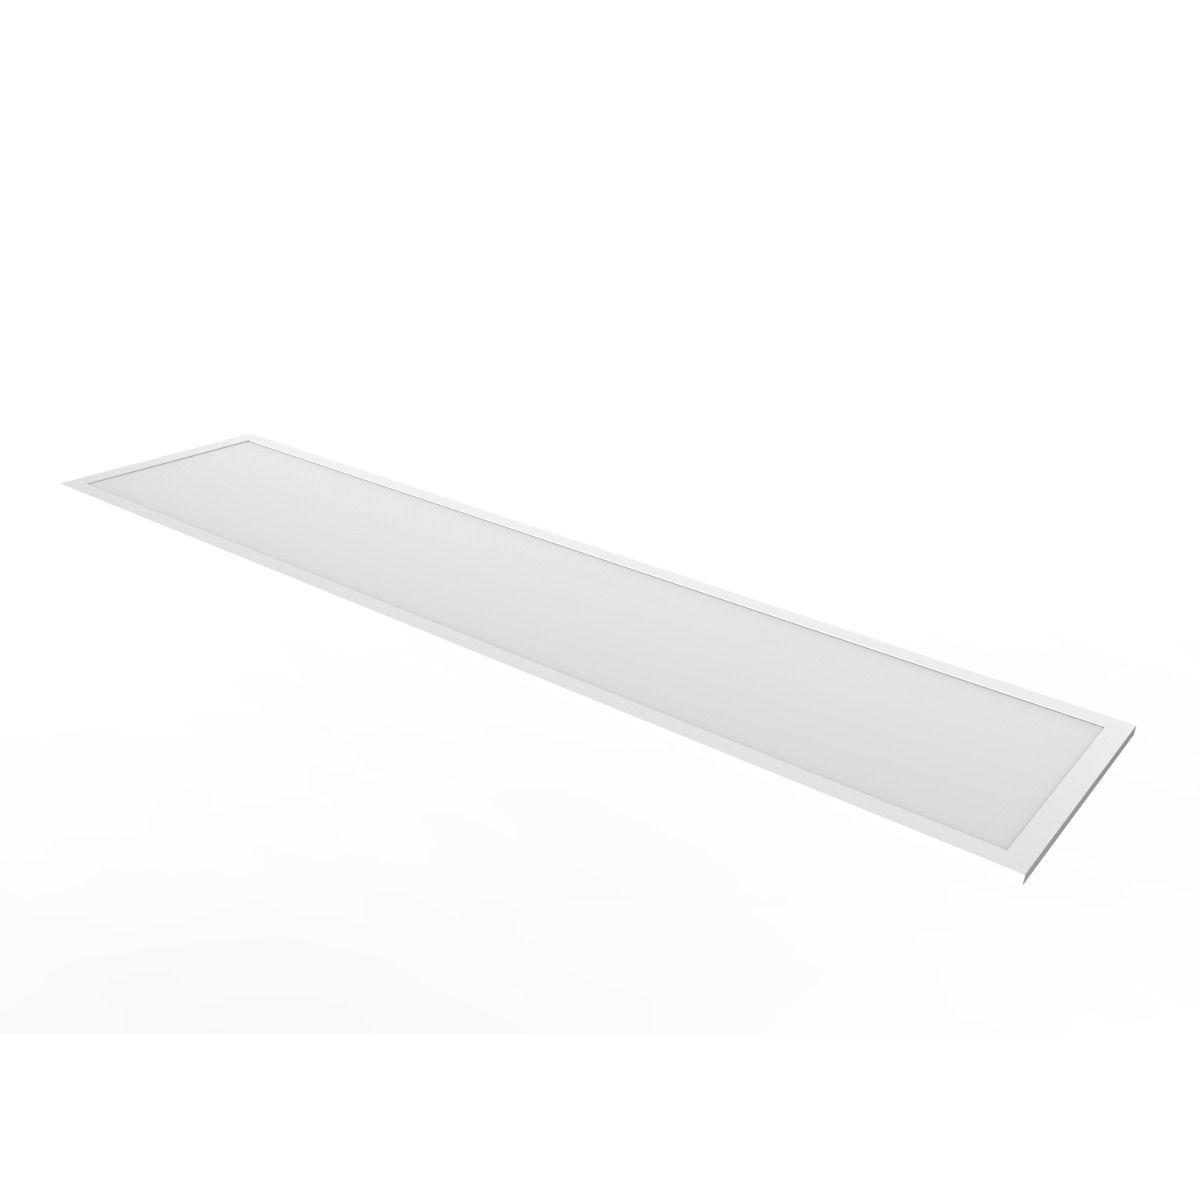 Noxion Panel LED Ecowhite V2.0 30x120cm 4000K 36W UGR <19 | Blanco Frio - Reemplazo 2x36W